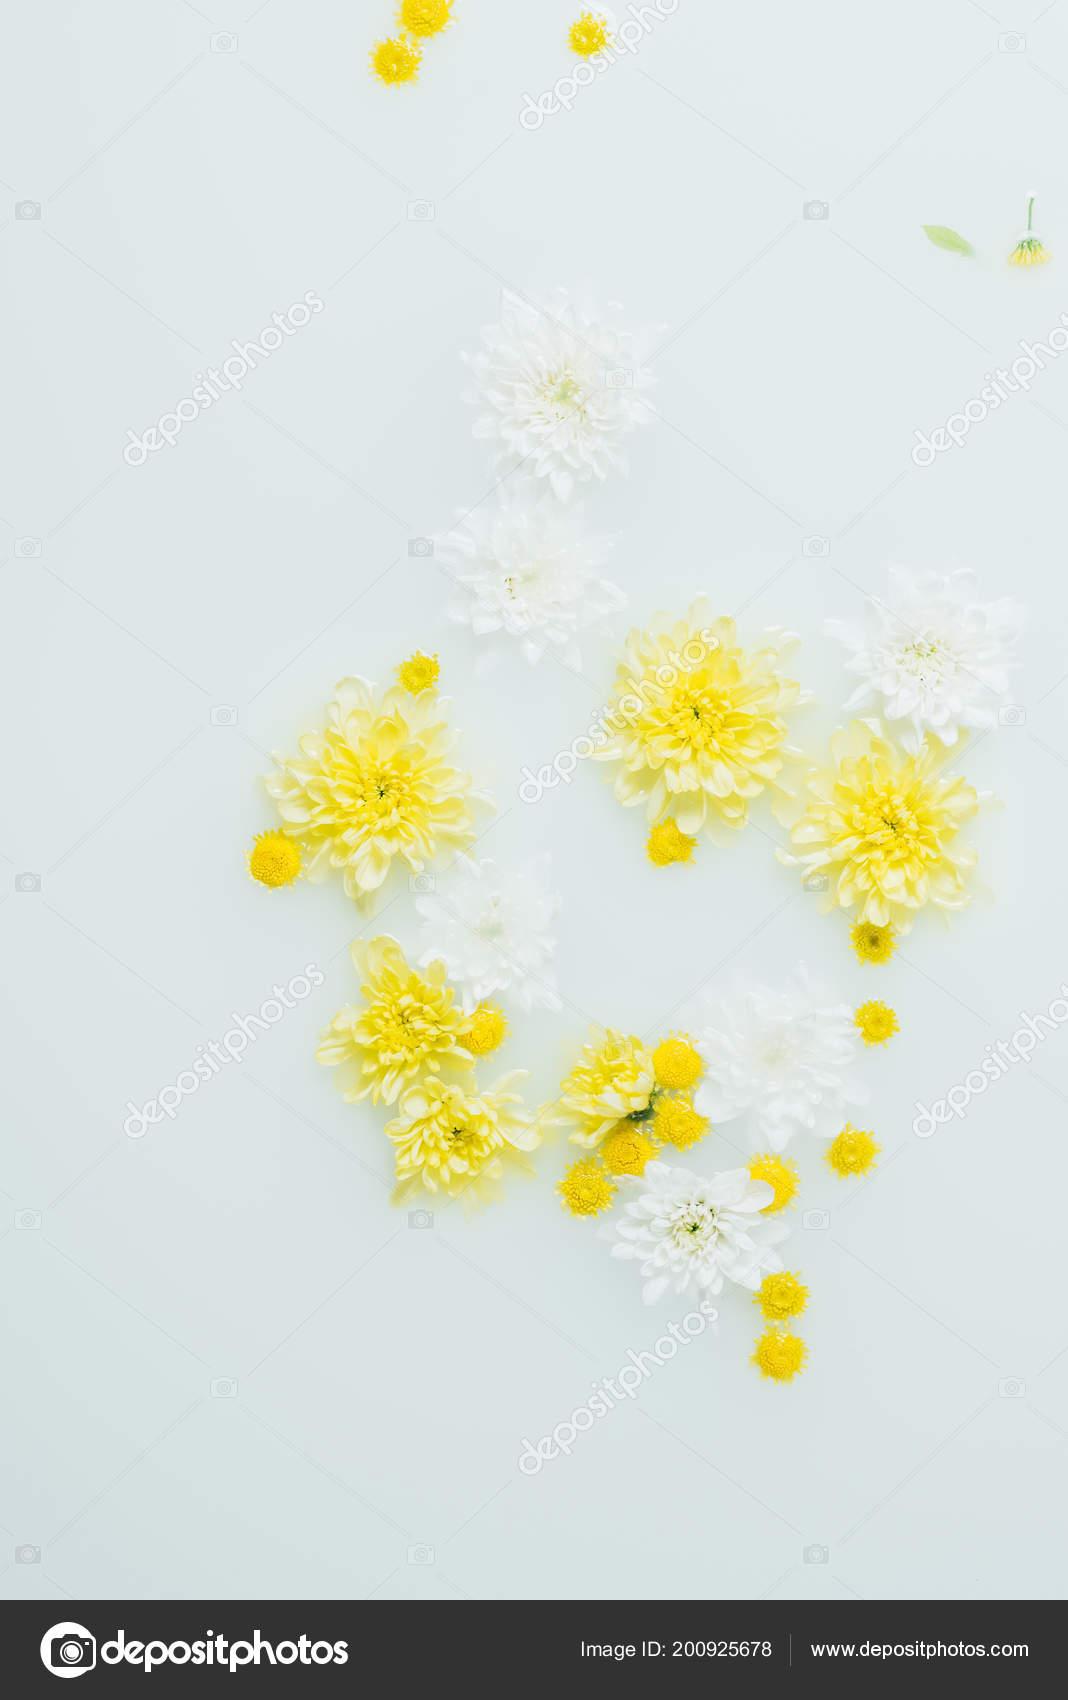 Top View Yellow White Chrysanthemum Flowers Milk Backdrop Stock